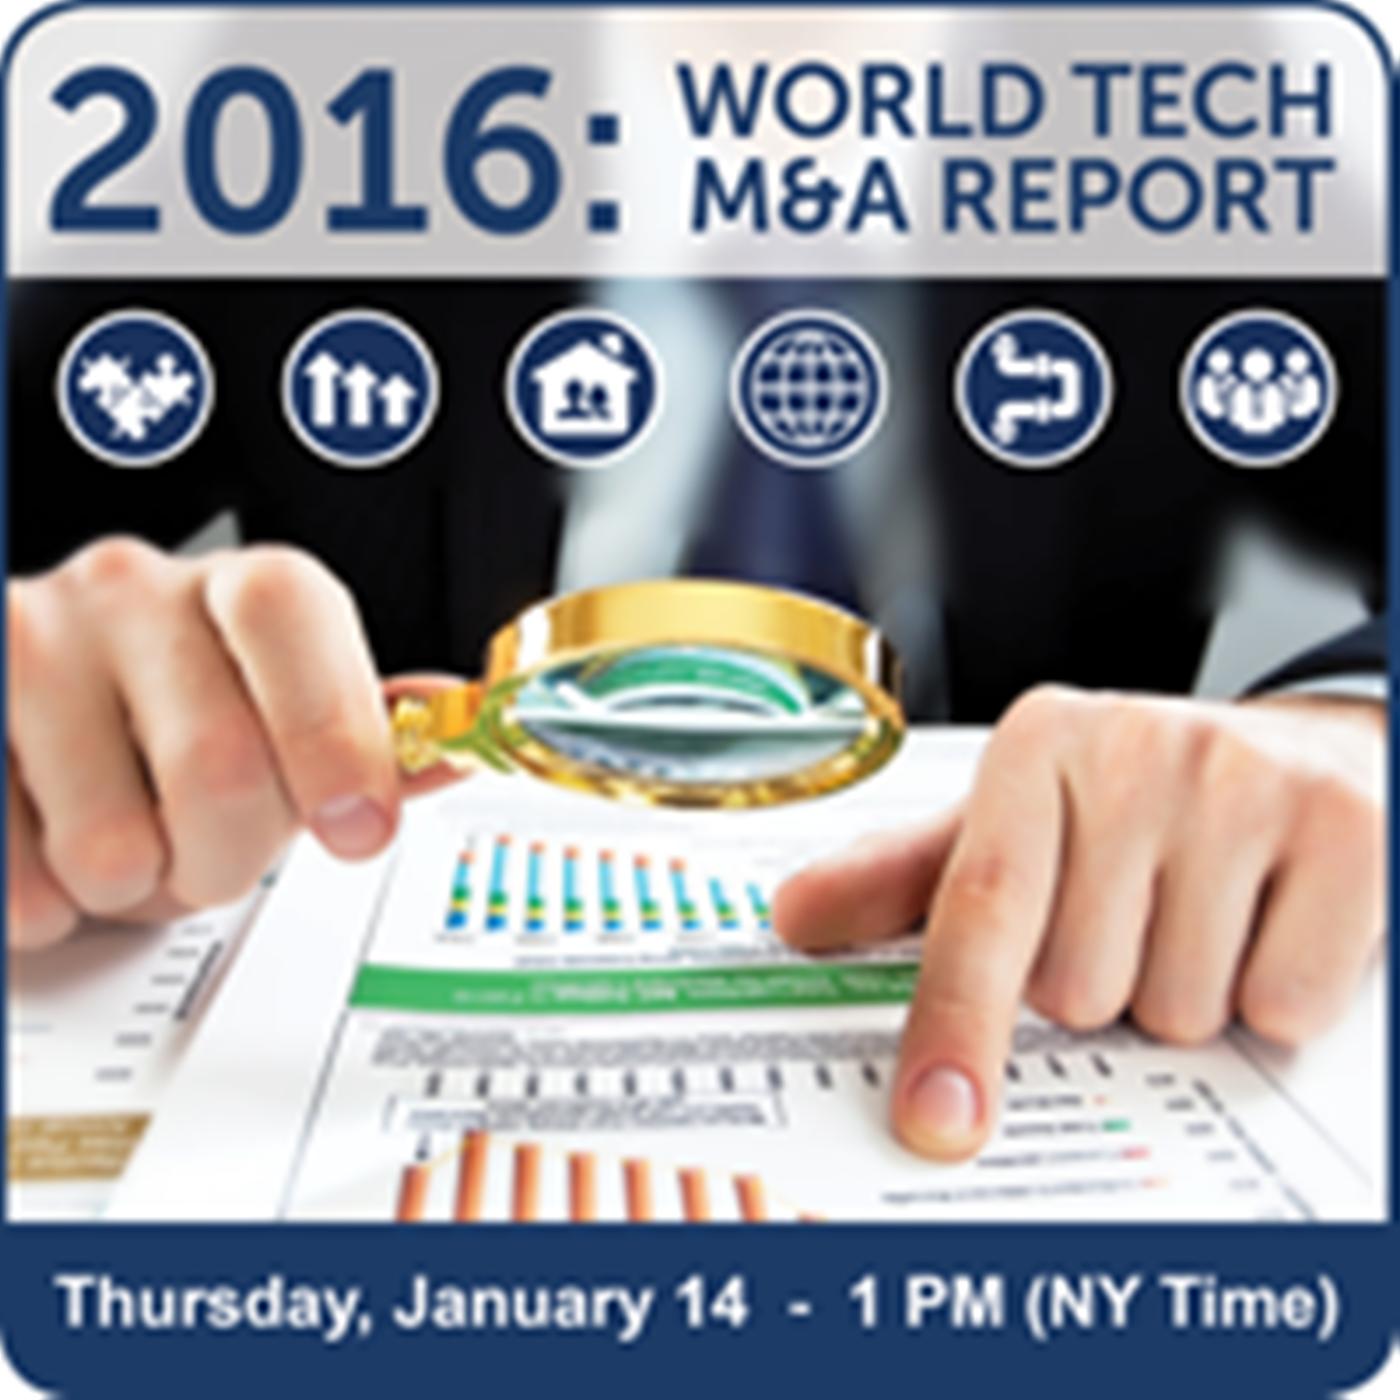 Tech M&A Annual Report - Top 10 Disruptive Tech Trends #3 & 4